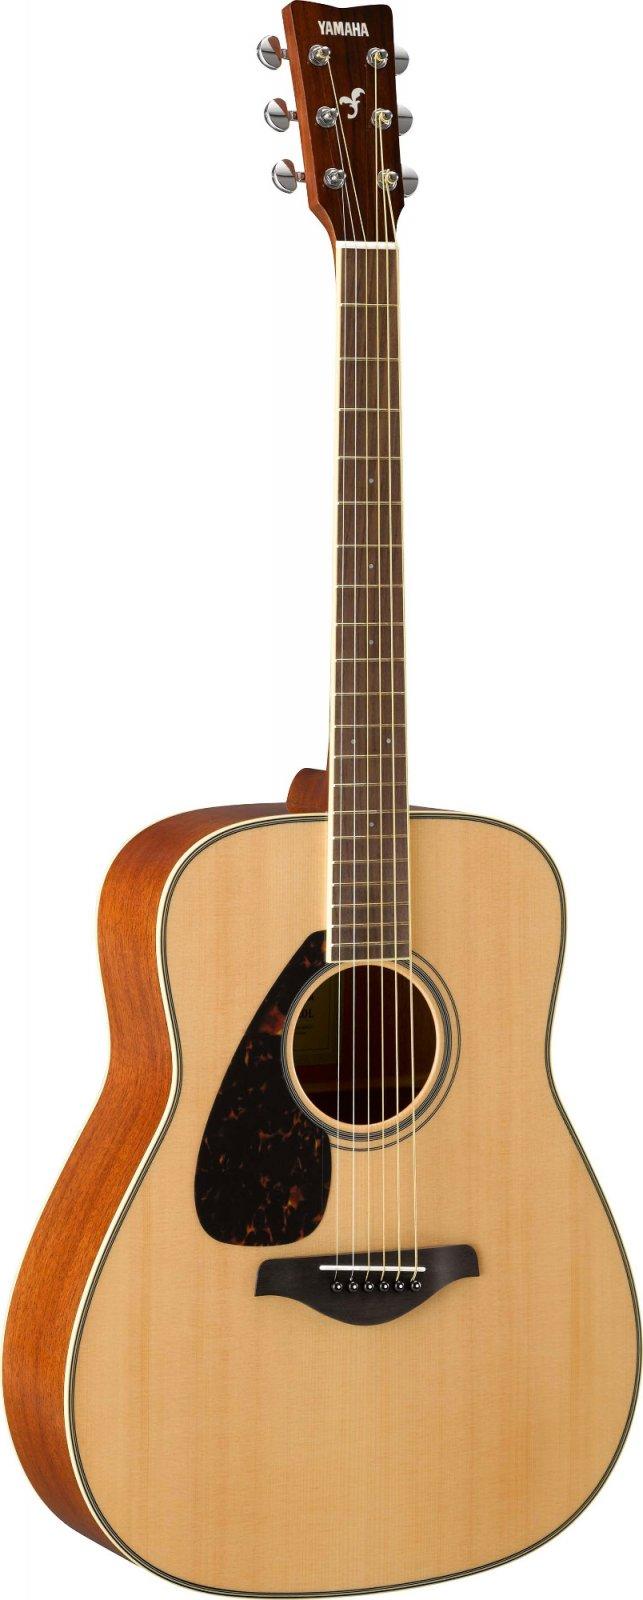 Yamaha FG820 Left-Handed Folk Guitar - Solid Spruce Top, Mahogany BS